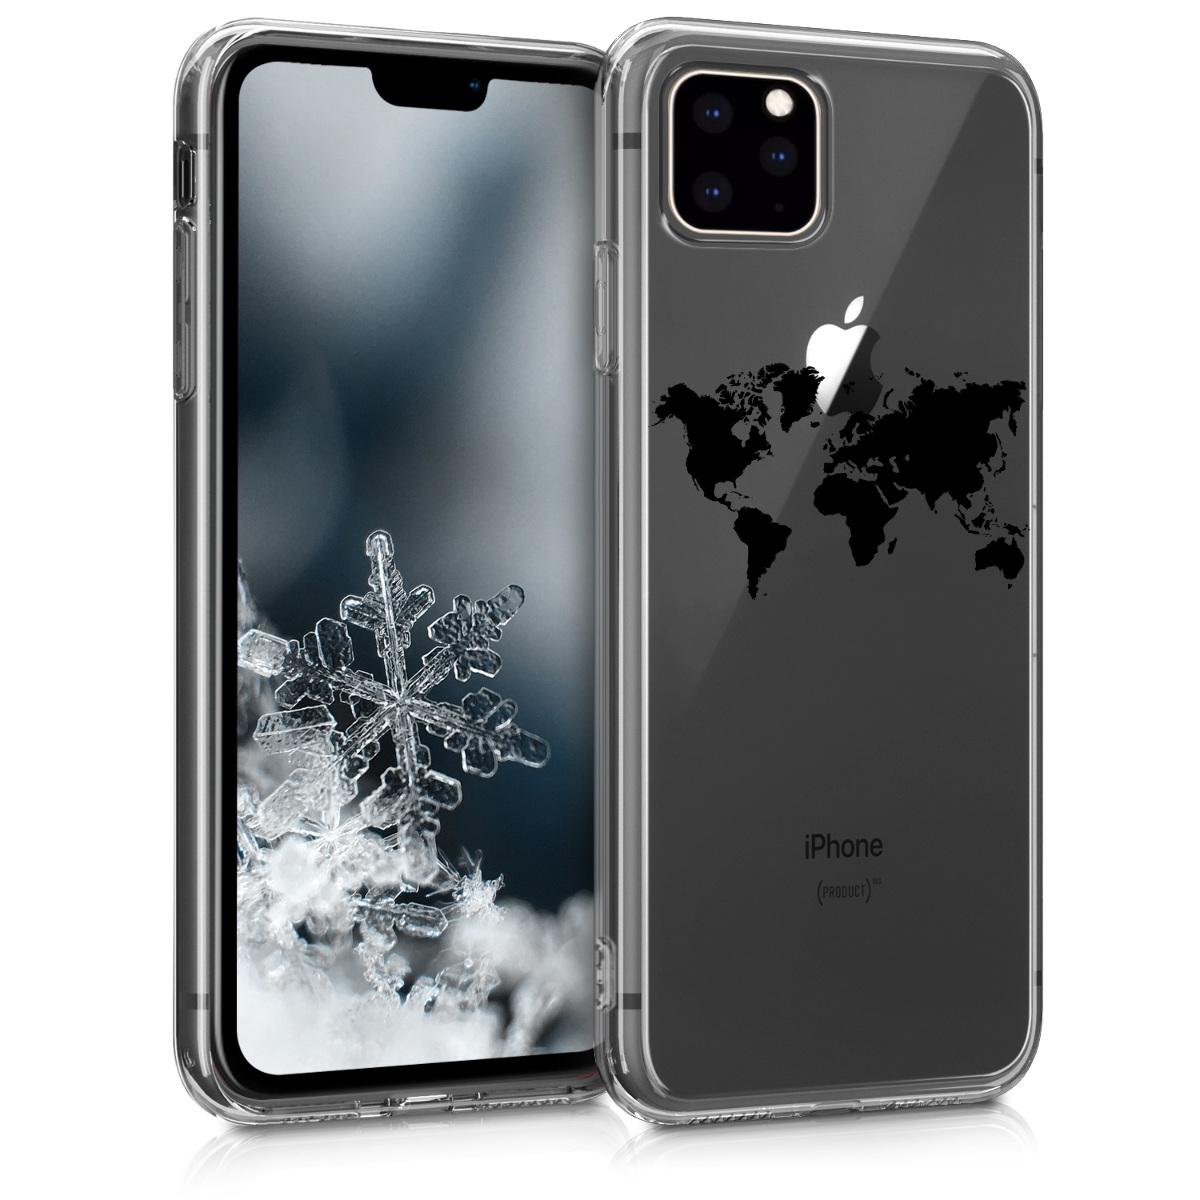 KW Θήκη Σιλικόνης iPhone 11 Pro Max - Black / Transparent (49794.01)